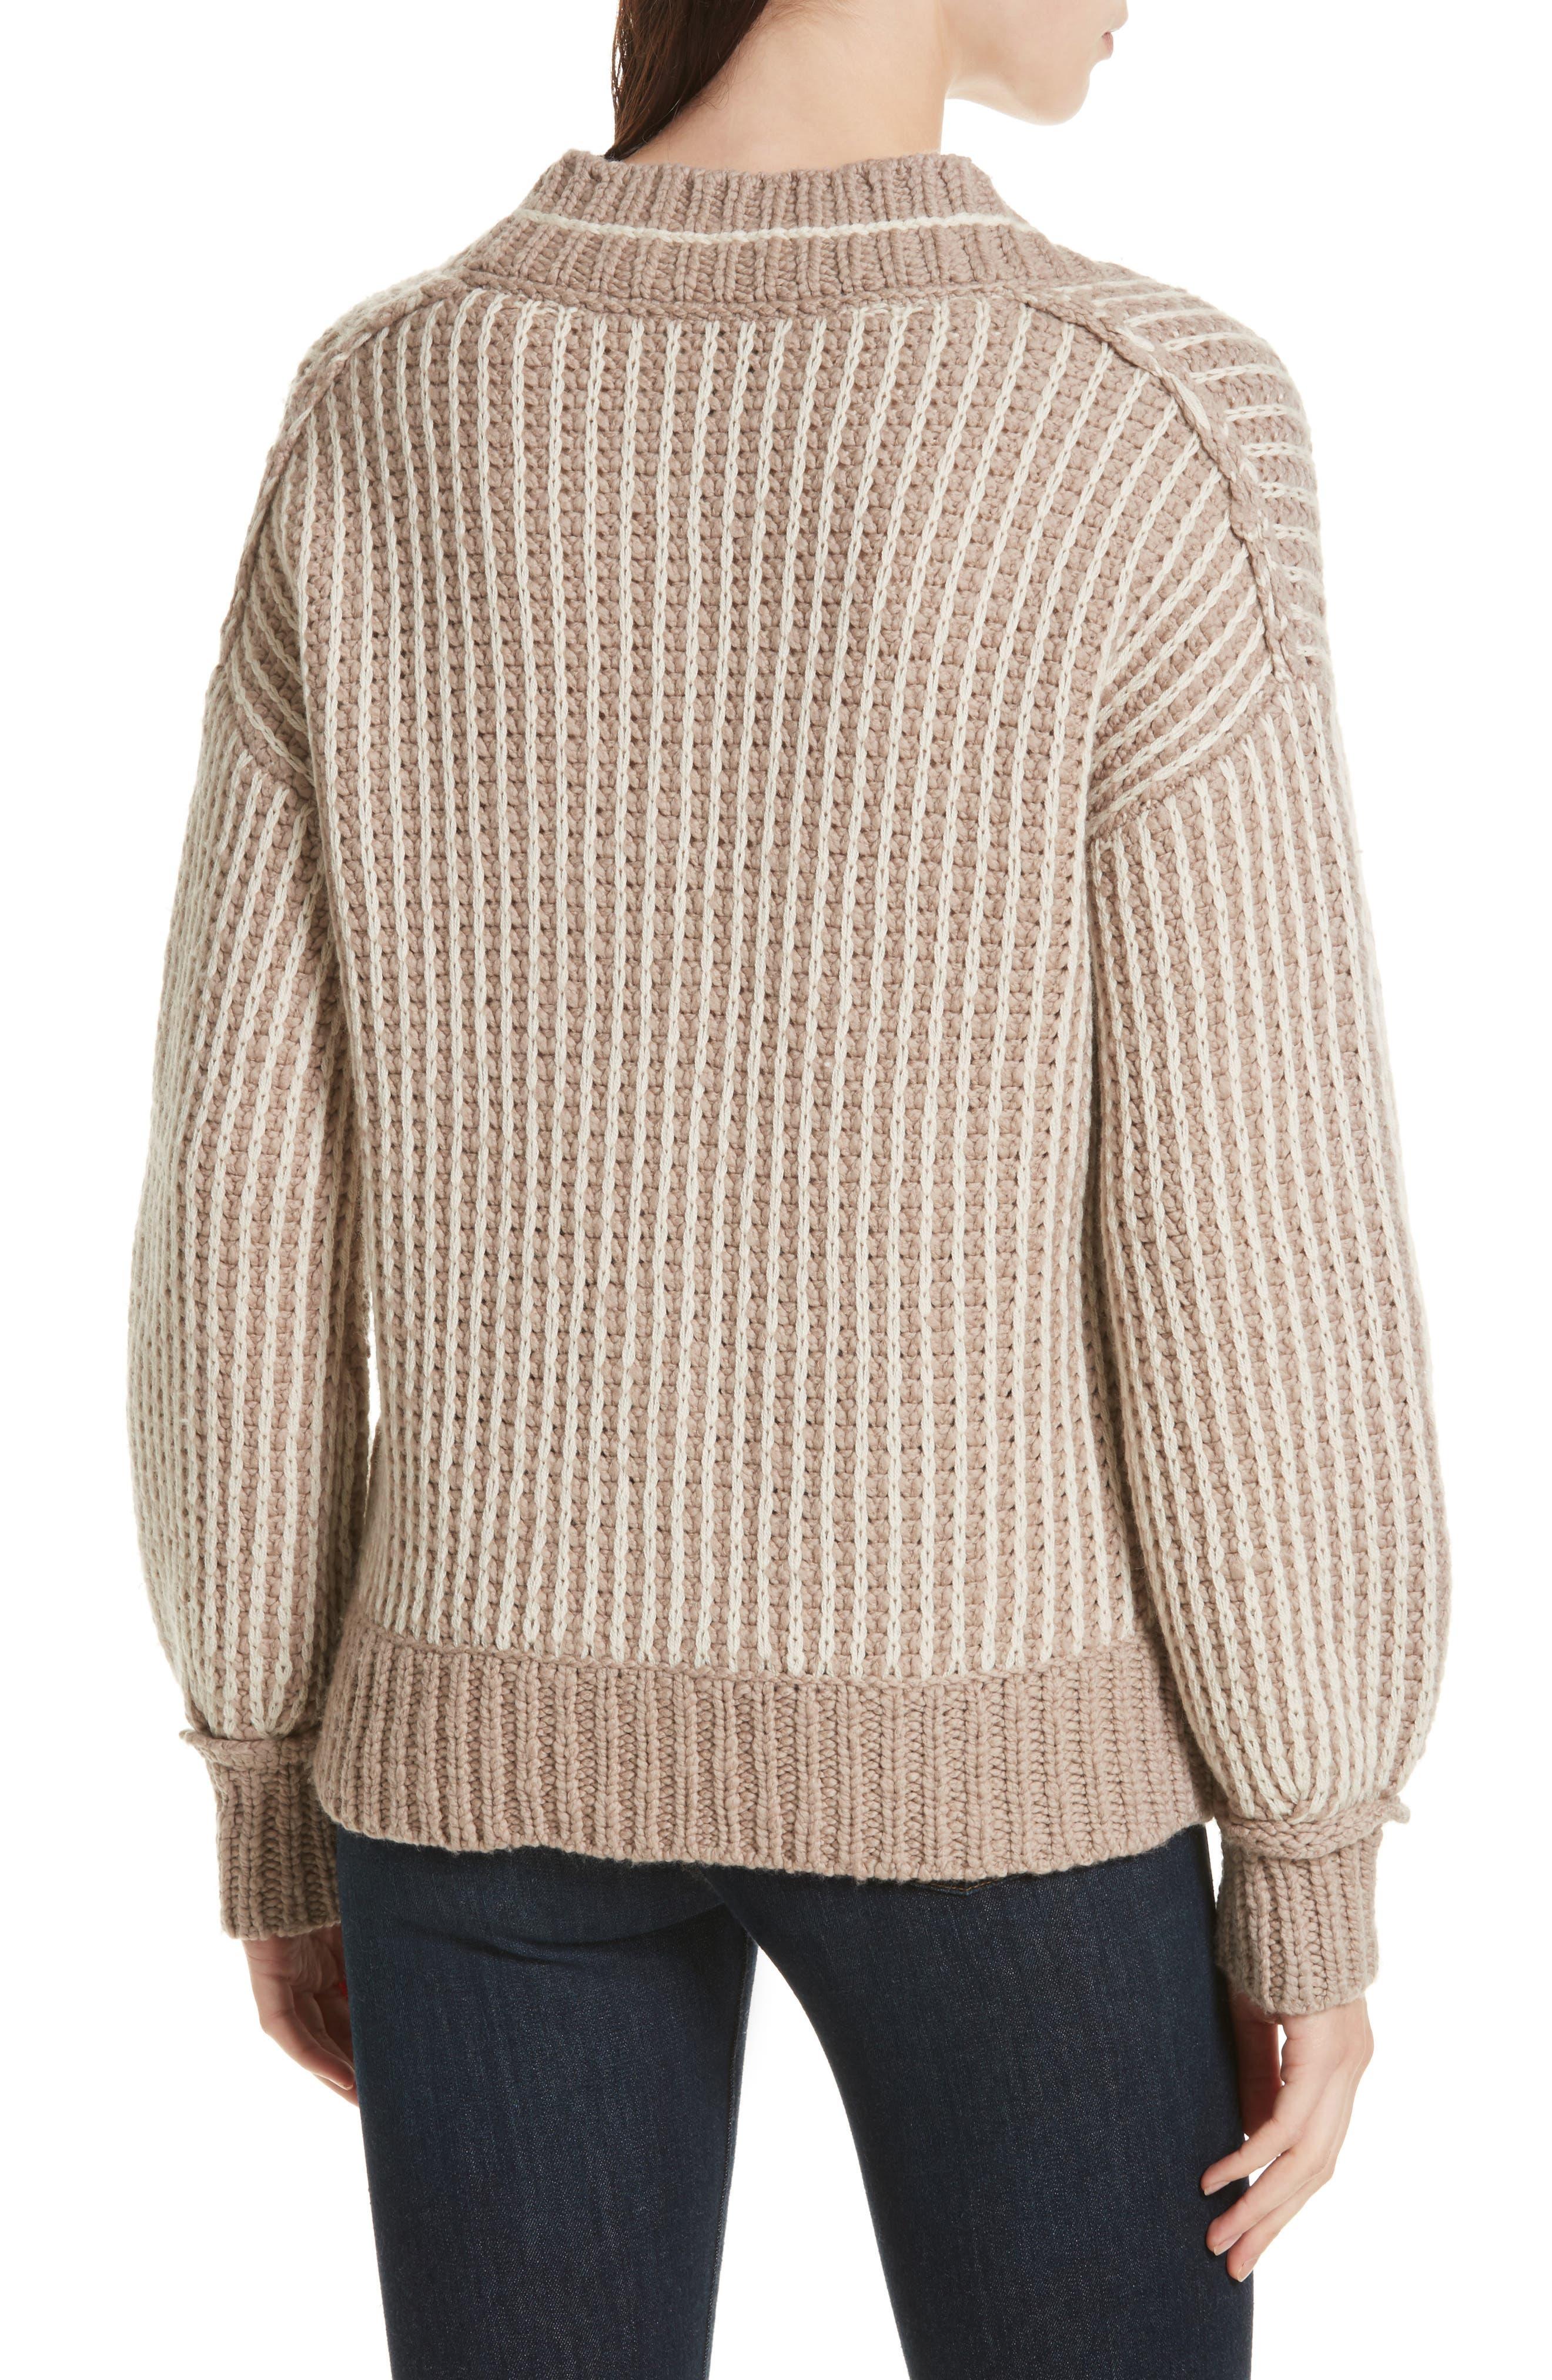 Jessen Stripe Wool & Cashmere Sweater,                             Alternate thumbnail 2, color,                             210